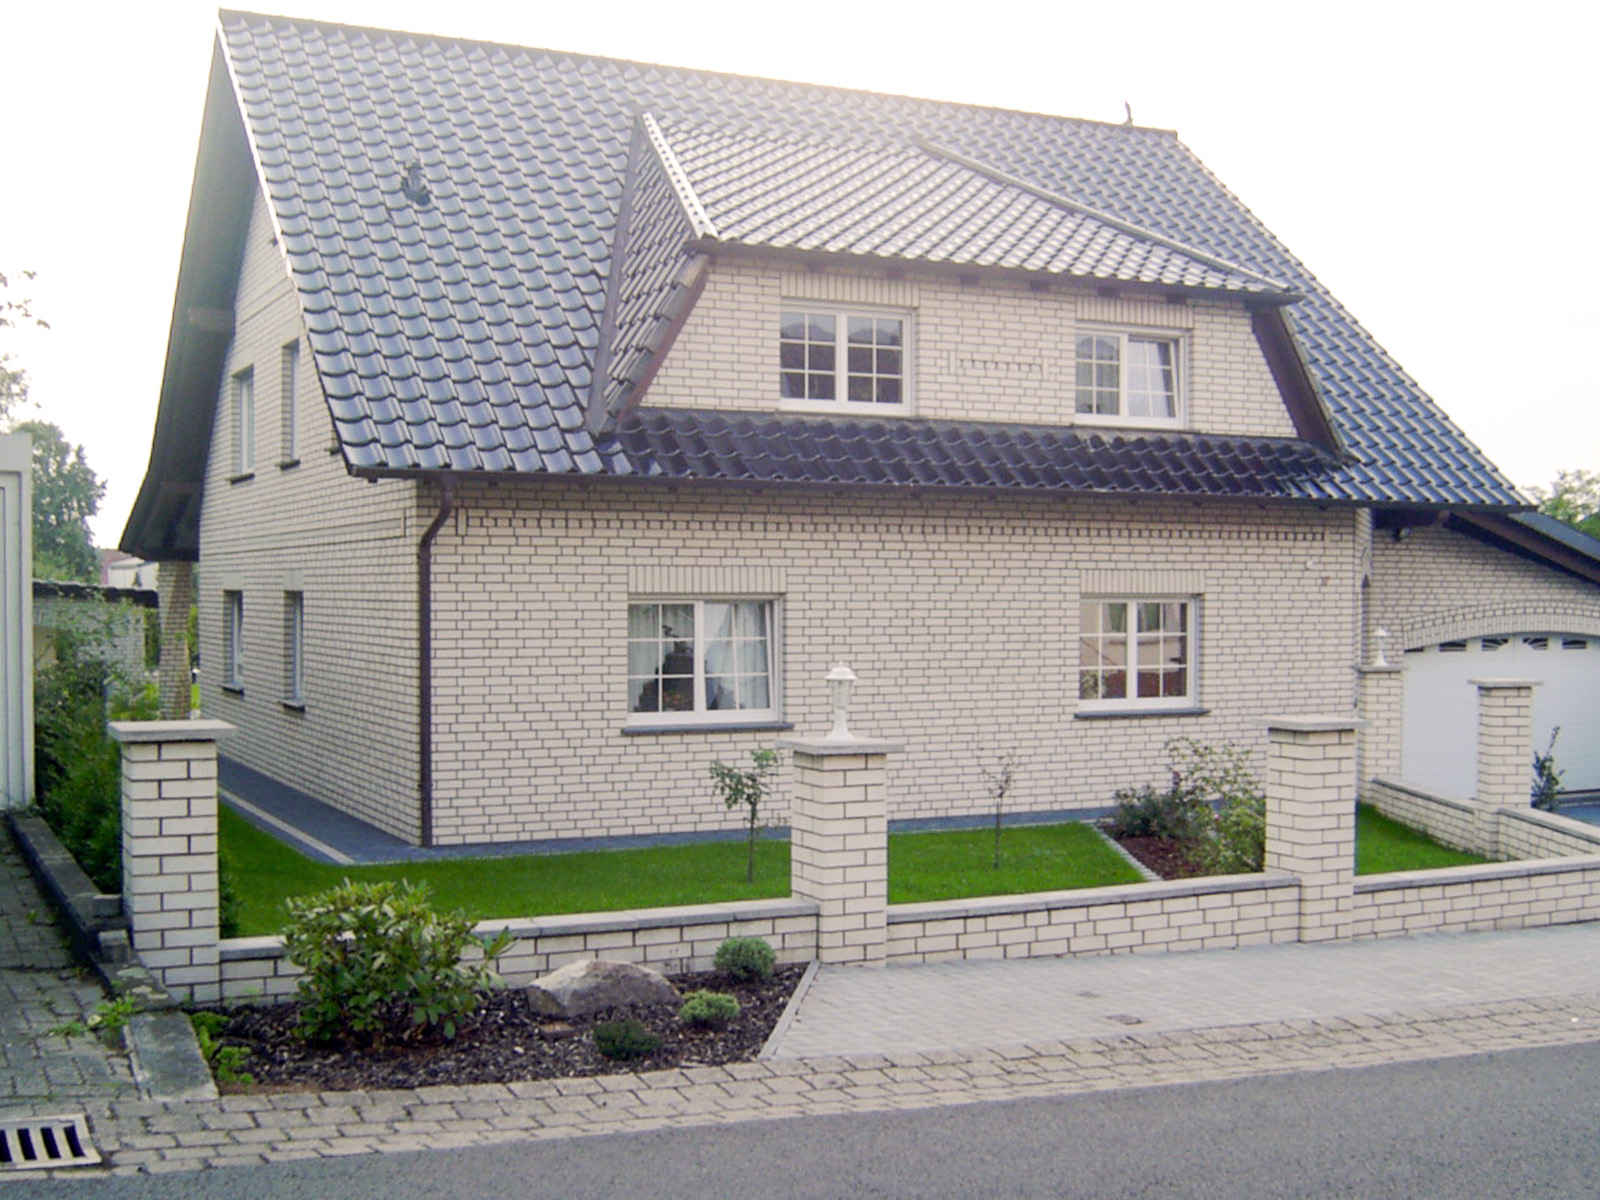 2 Familienwohnhaus